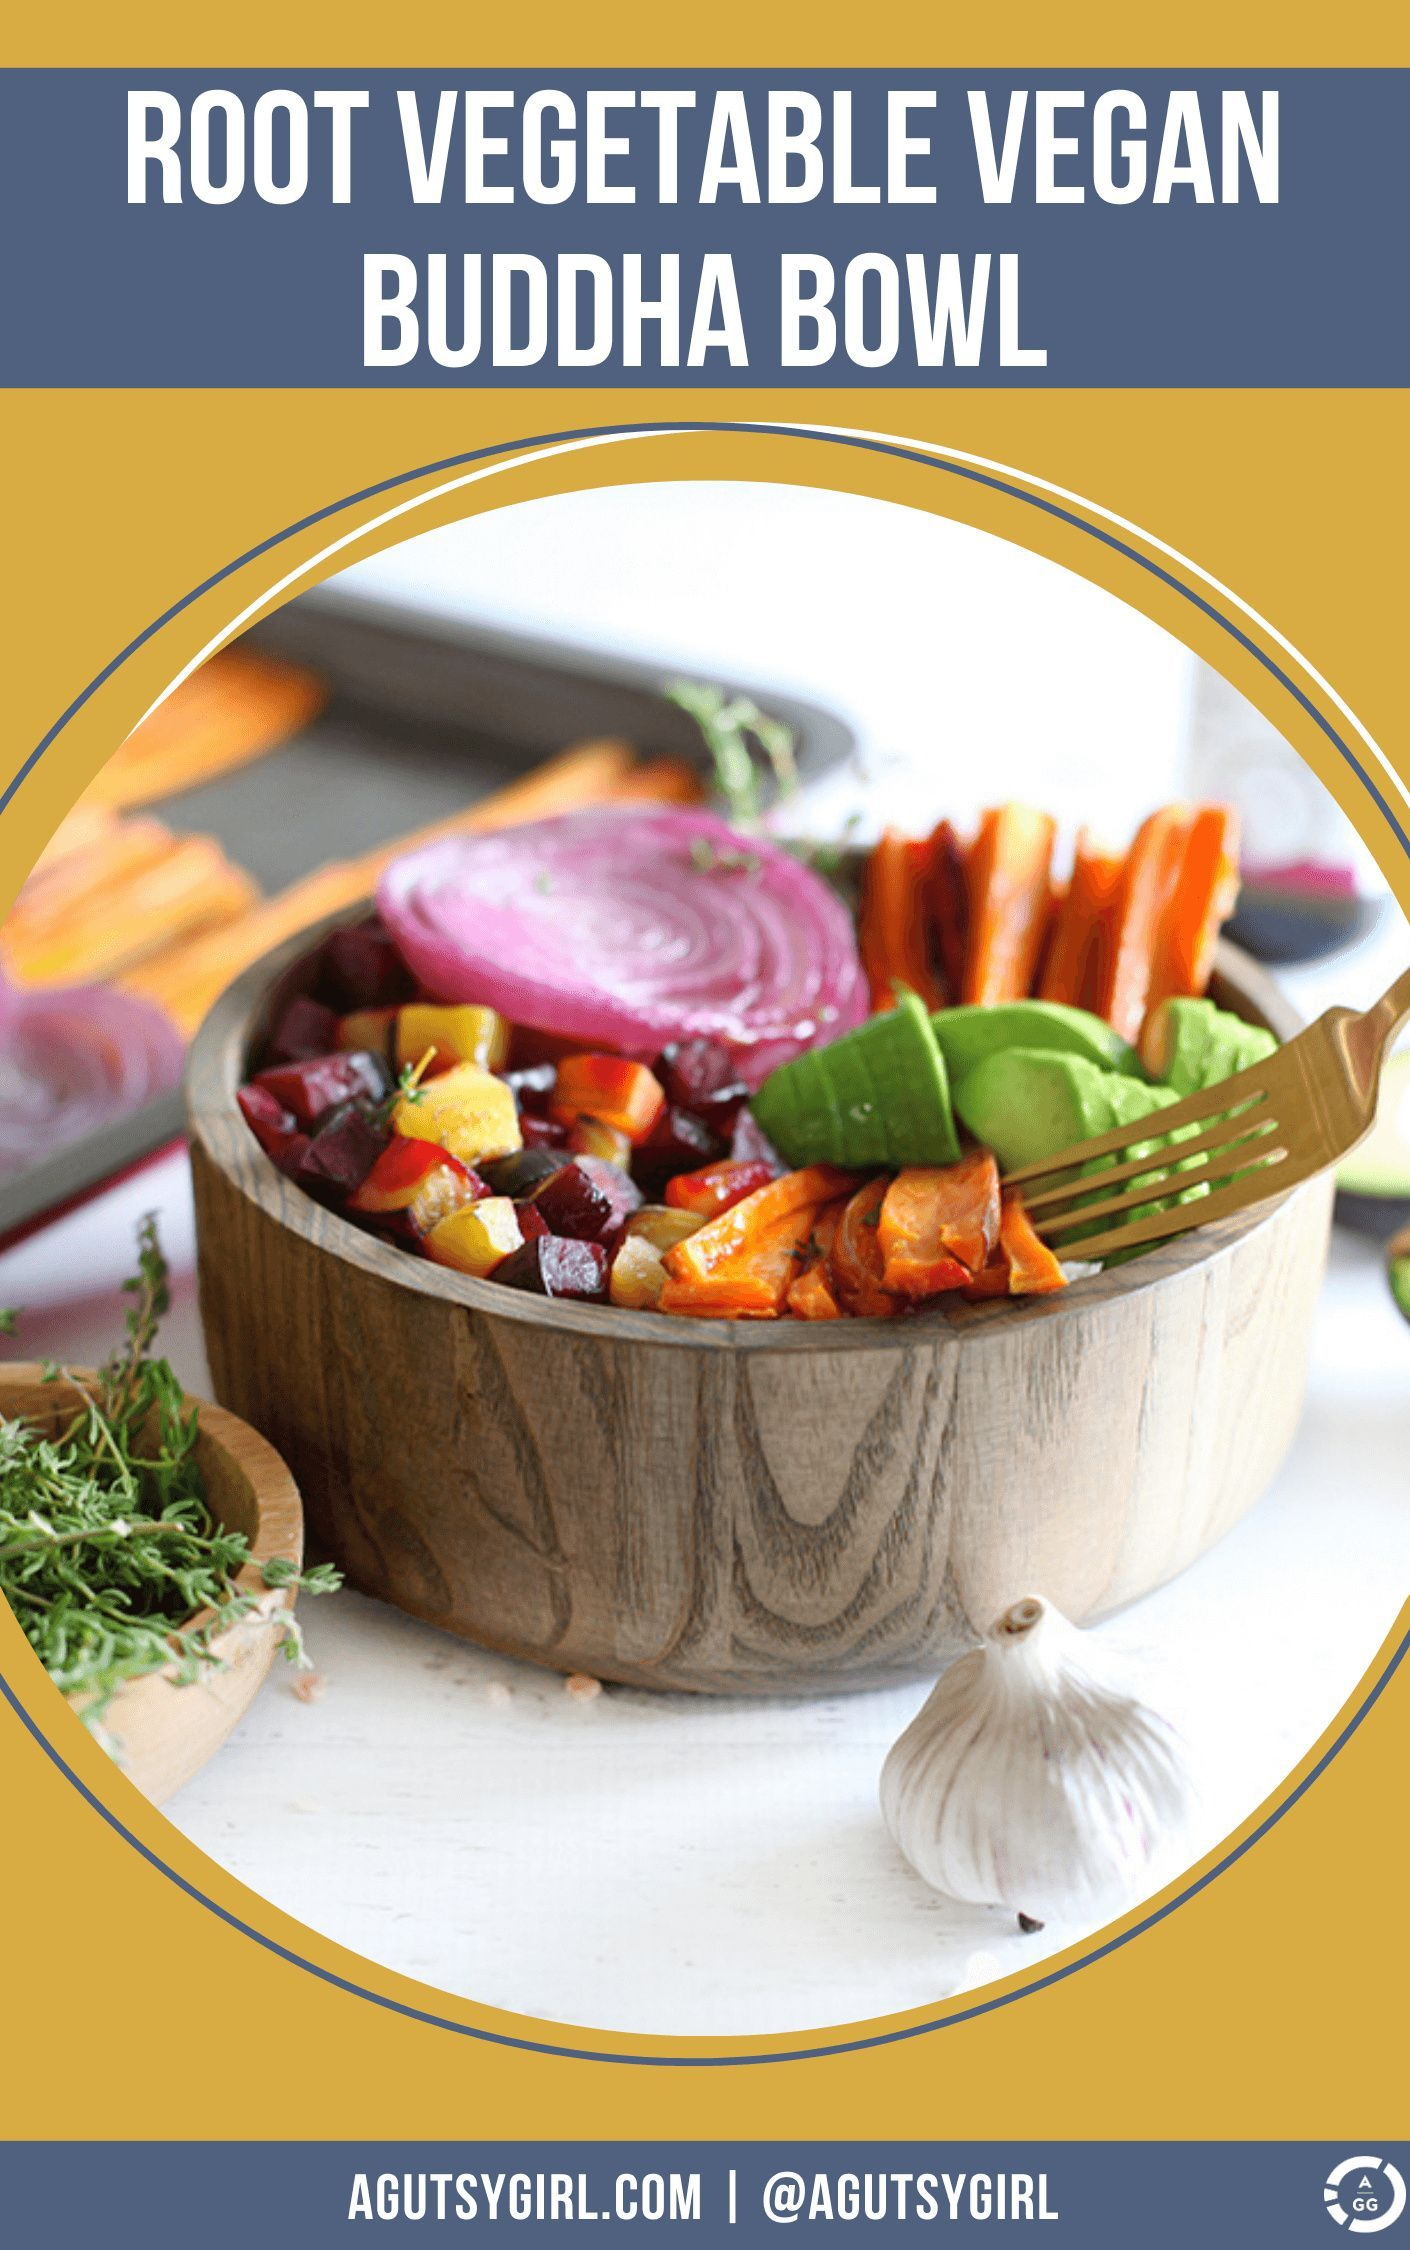 Root Vegetable Vegan Buddha Bowl recipe agutsygirl.com #veganrecipe #buddhabowl #fallvegetables fall #guthealth